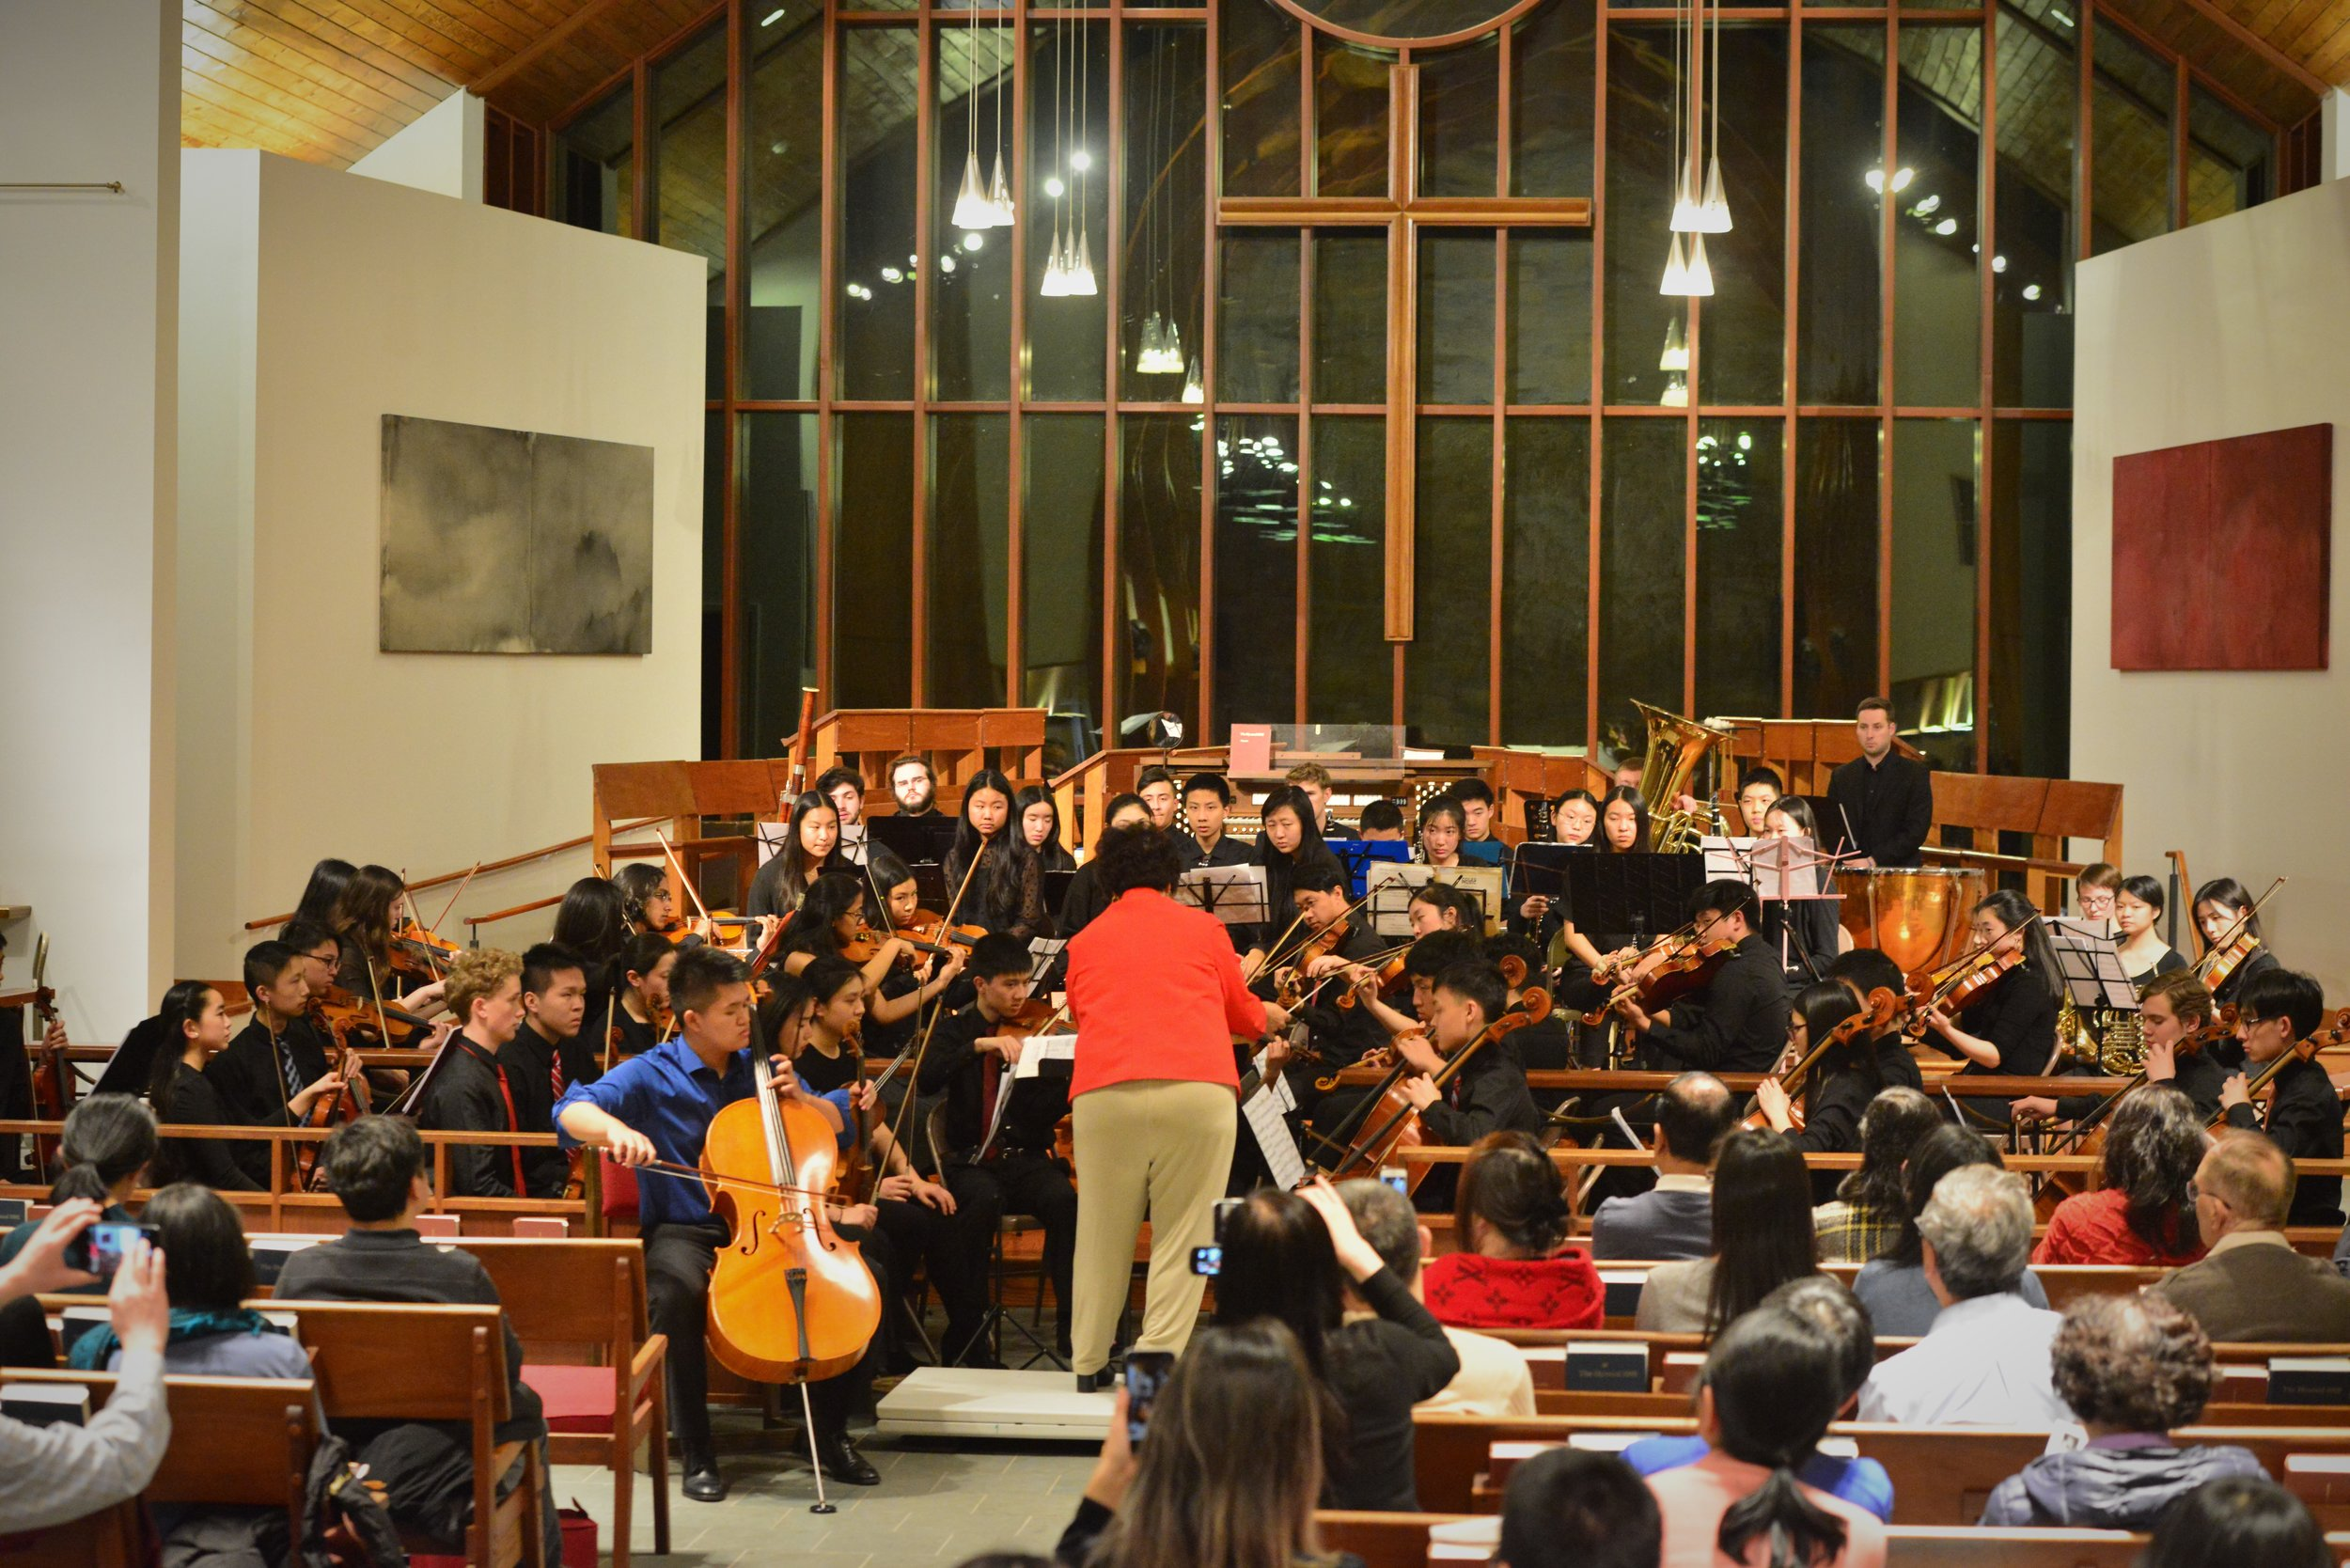 Elgar Cello Concerto, performed by Richard Yuan